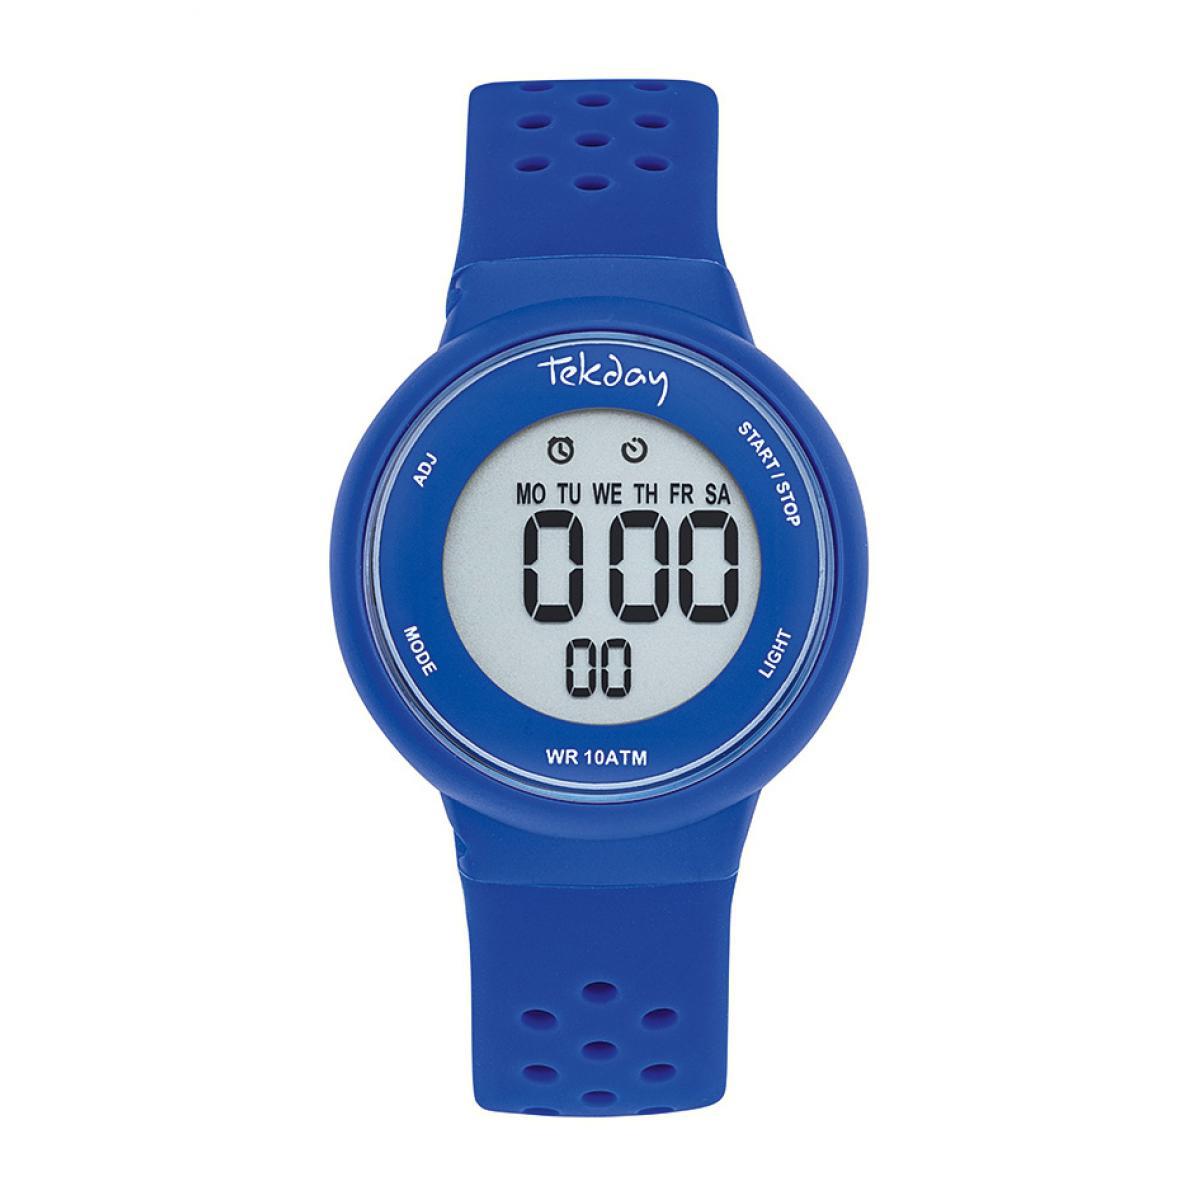 Montre 654684 - Montre Boîtier Silicone Bleu Bracelet Silicone Bleu - Tekday - Modalova